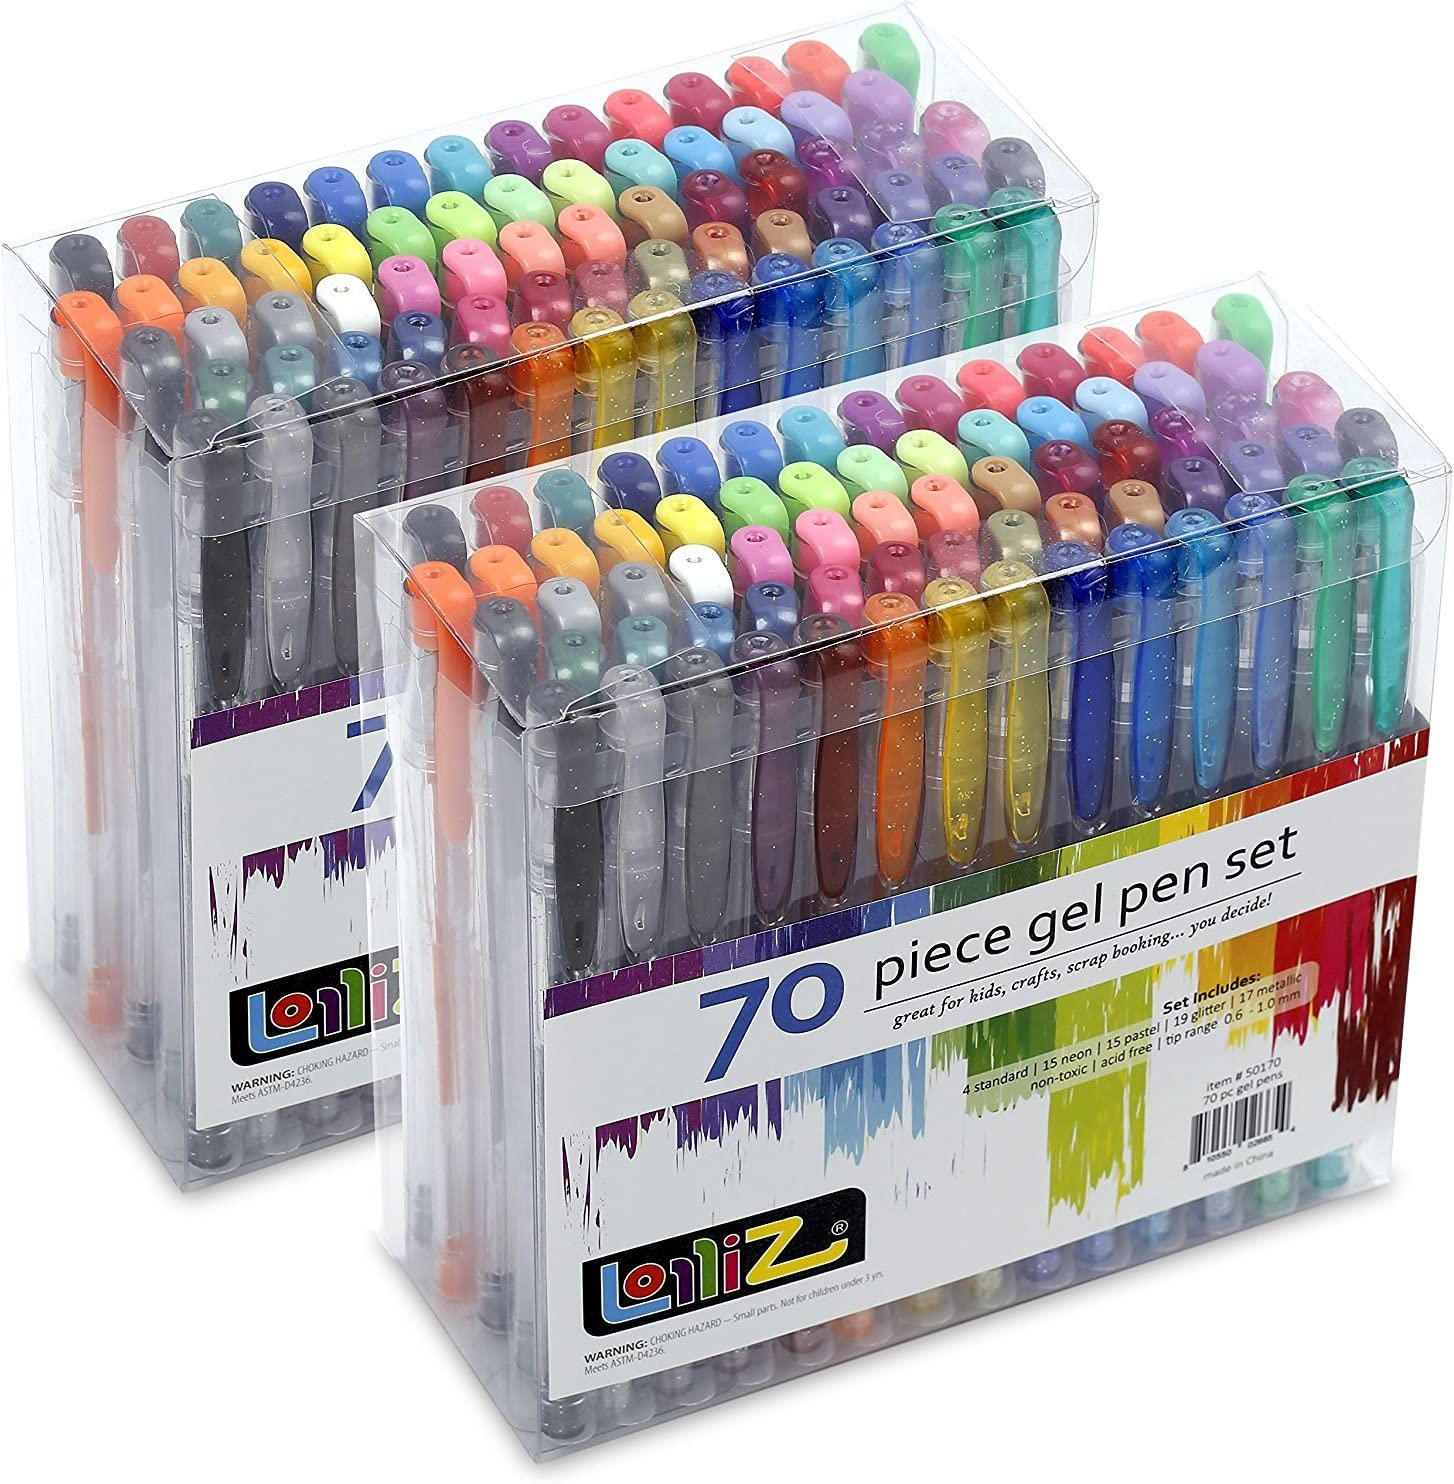 LolliZ Gel Pens 70 Pen Tray Set – Set de 2: Amazon.es: Hogar